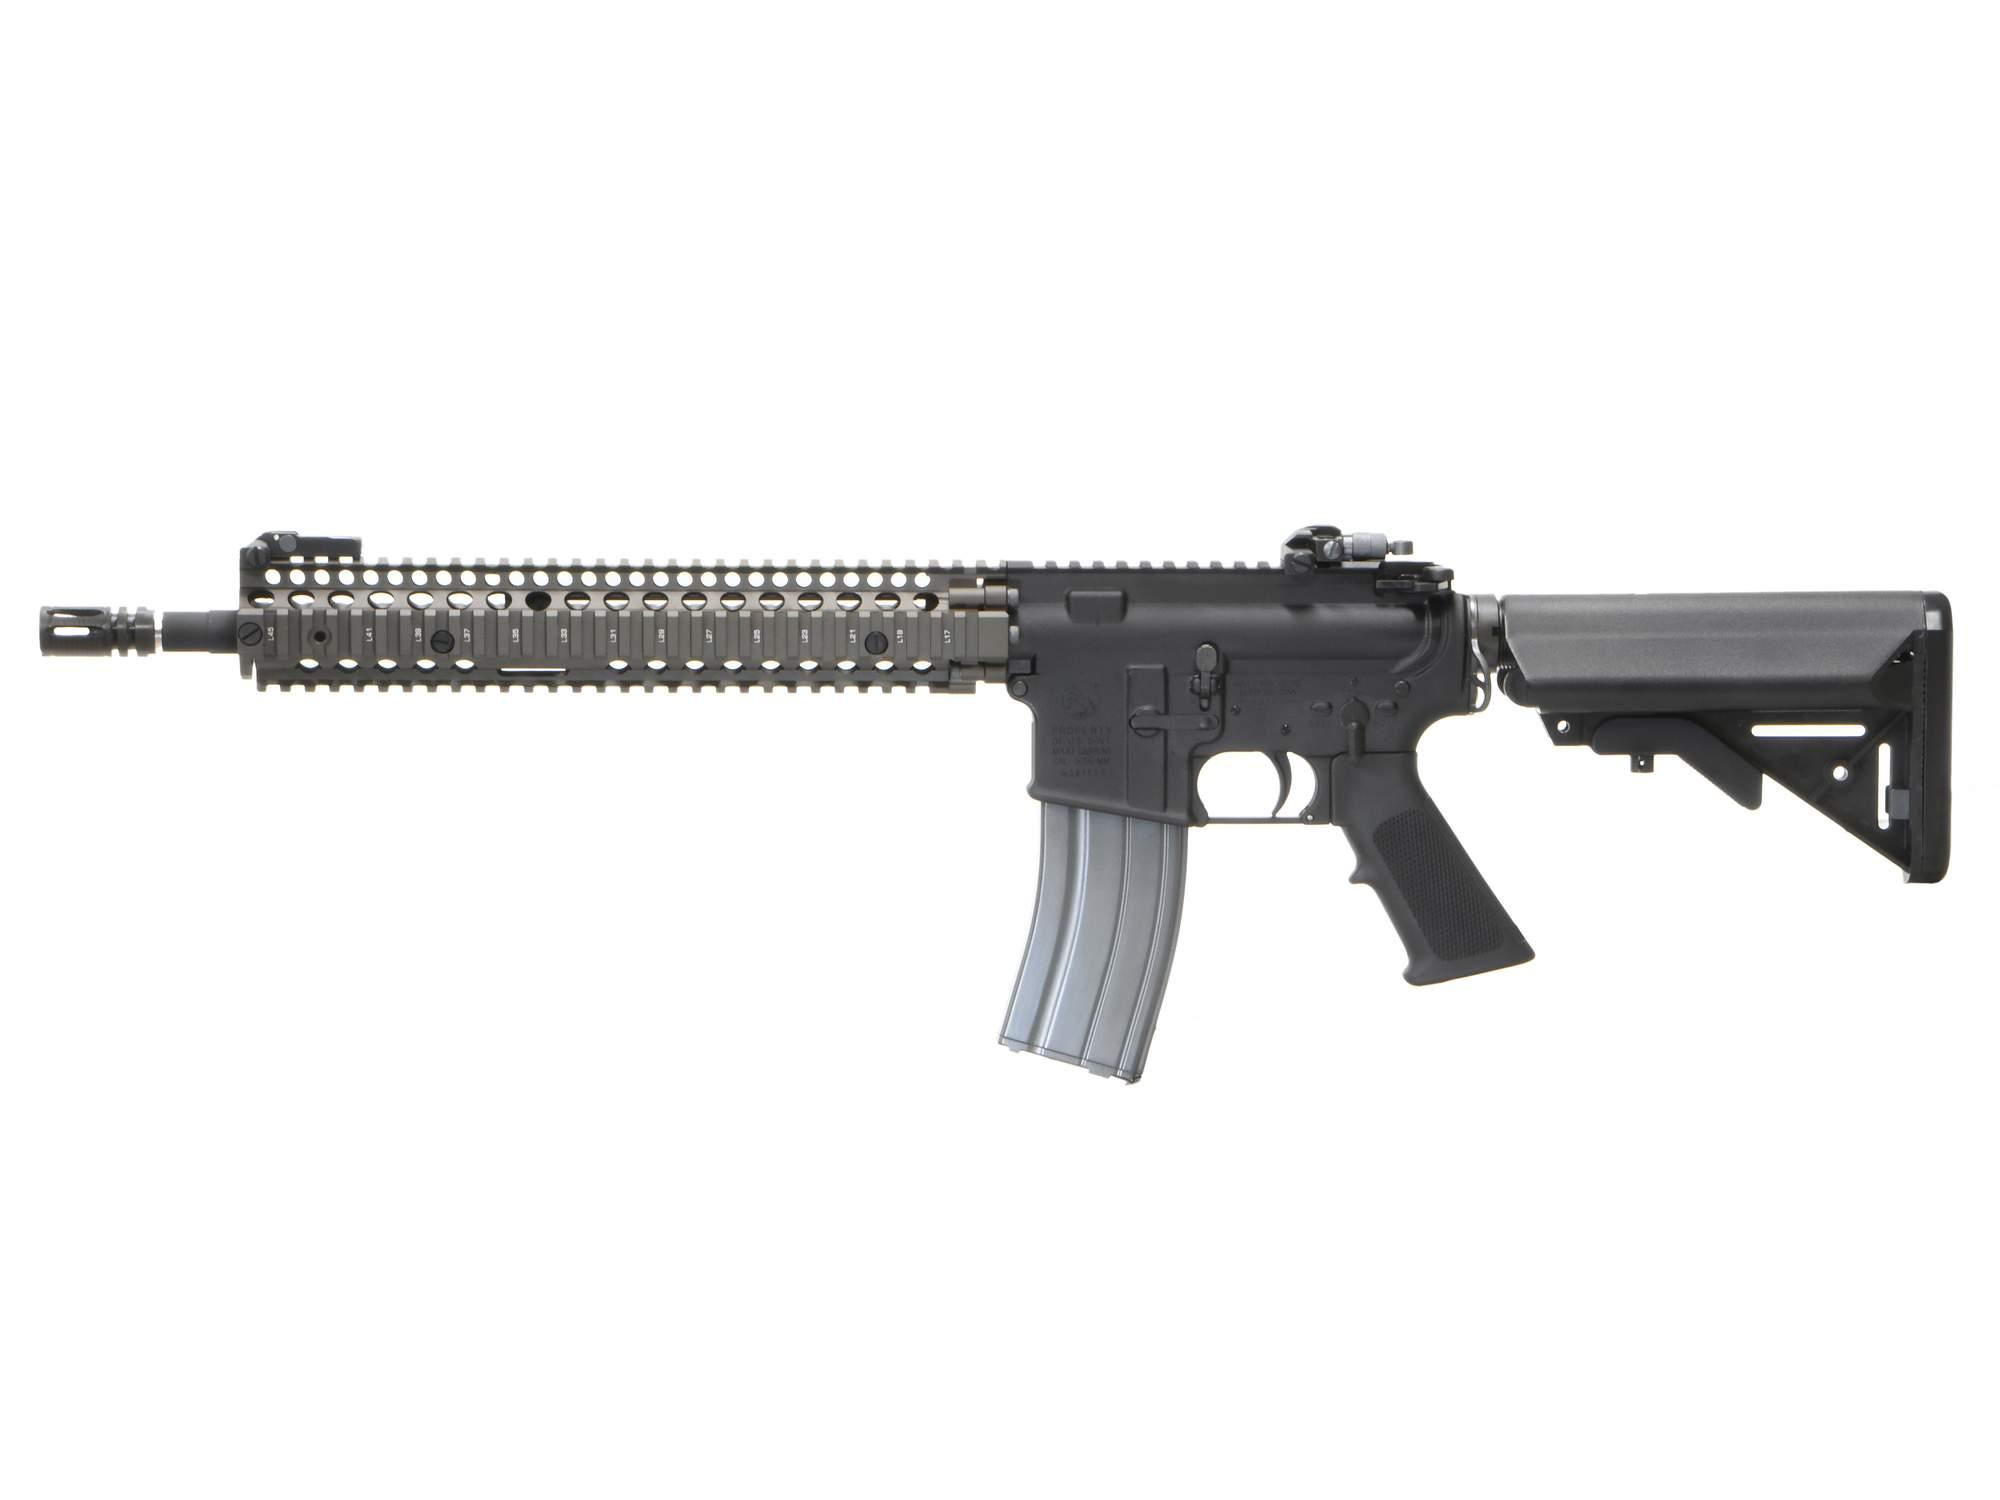 CyberGun Colt M4 RIS 14.5in GBBR V2 (JPver.)